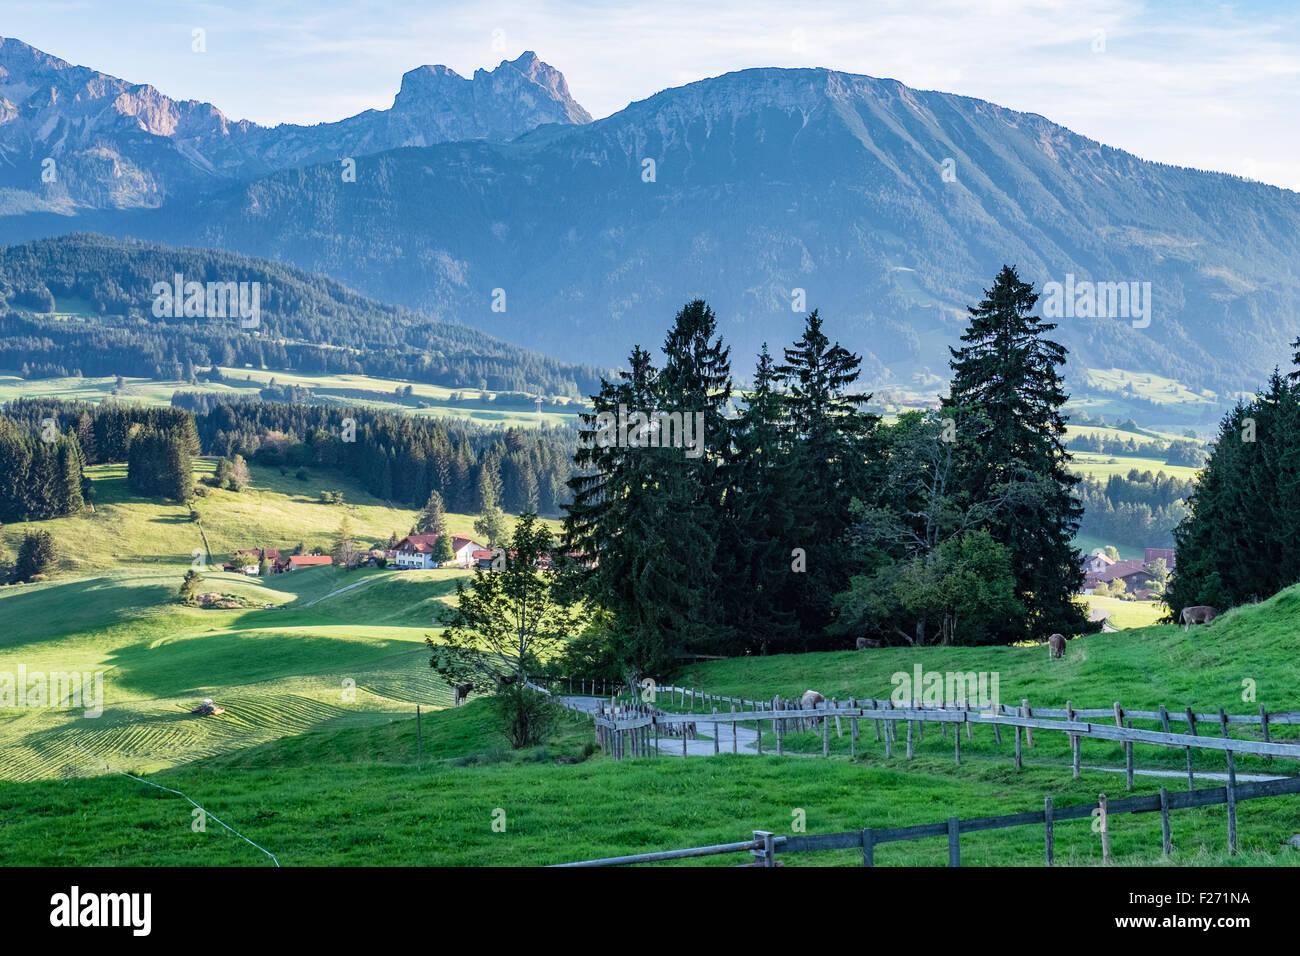 Bavarian Alps, landscape view of farm land, trees, mountains and sky, Eastern Allgaü, Bavaria, Germany - Stock Image